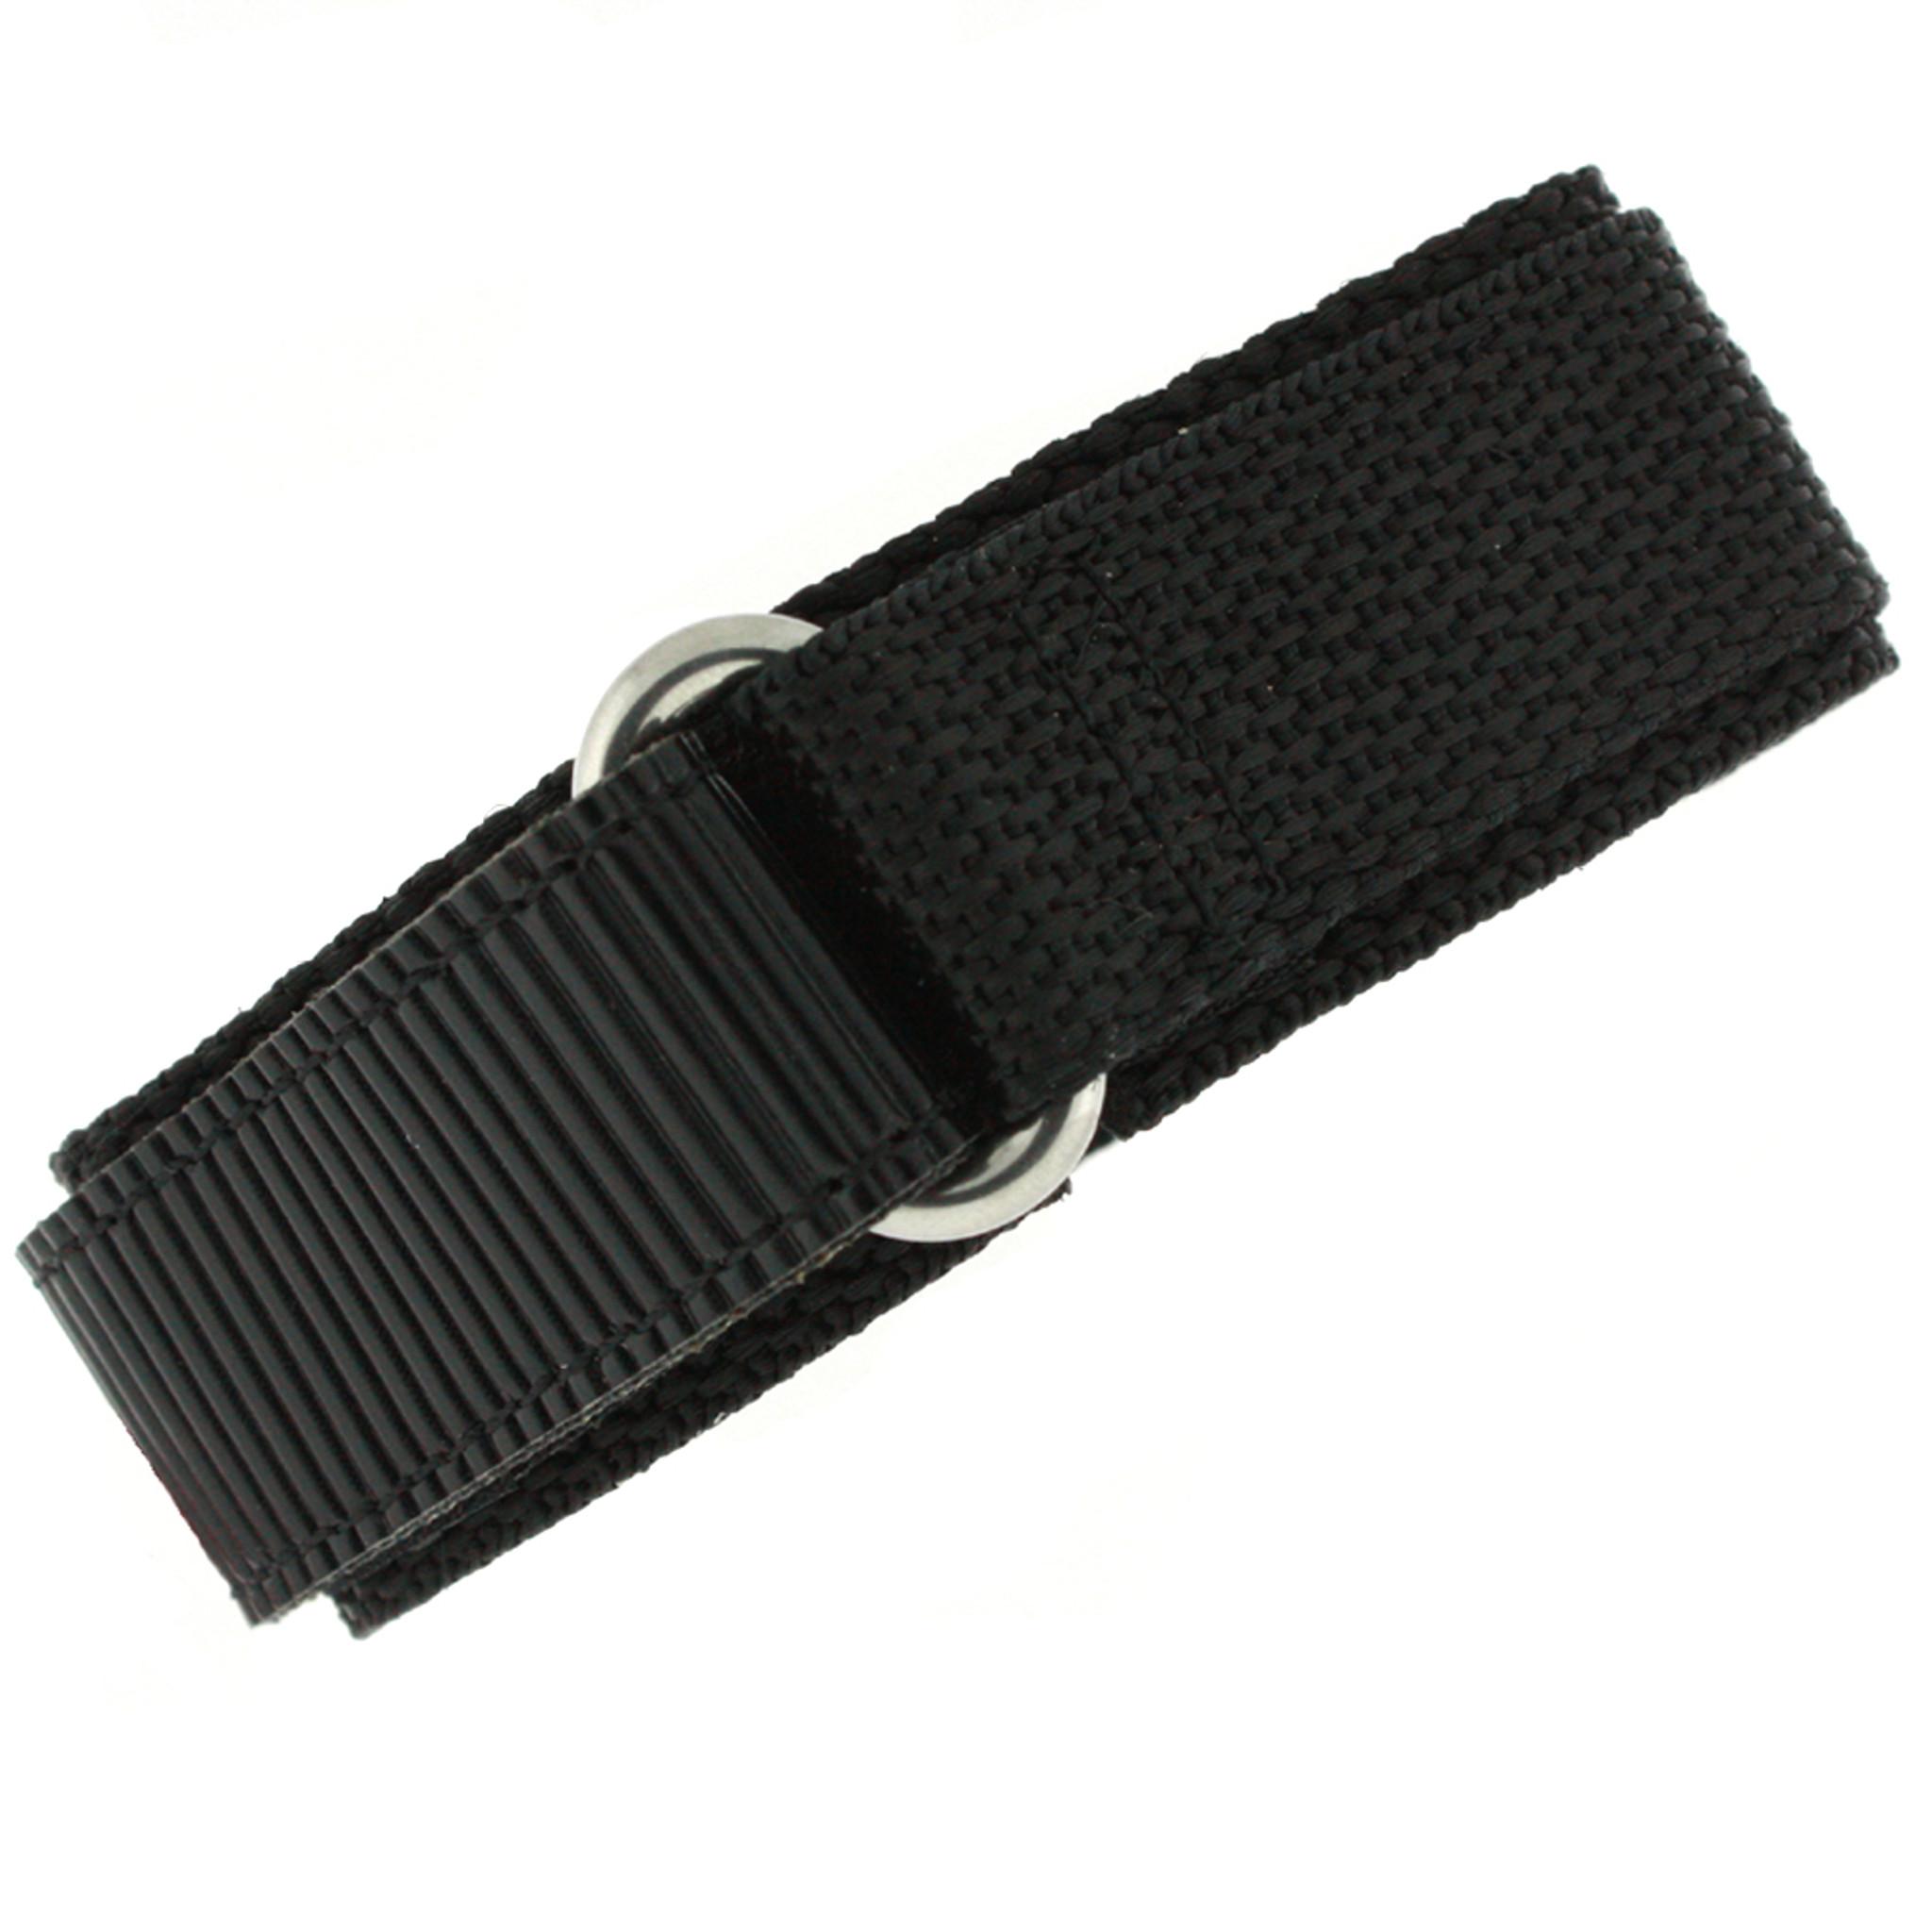 6cfd14c34 Black Velcro Watch Band   TechSwiss Black Velcro Watch Strap   VEL100BLK    Main